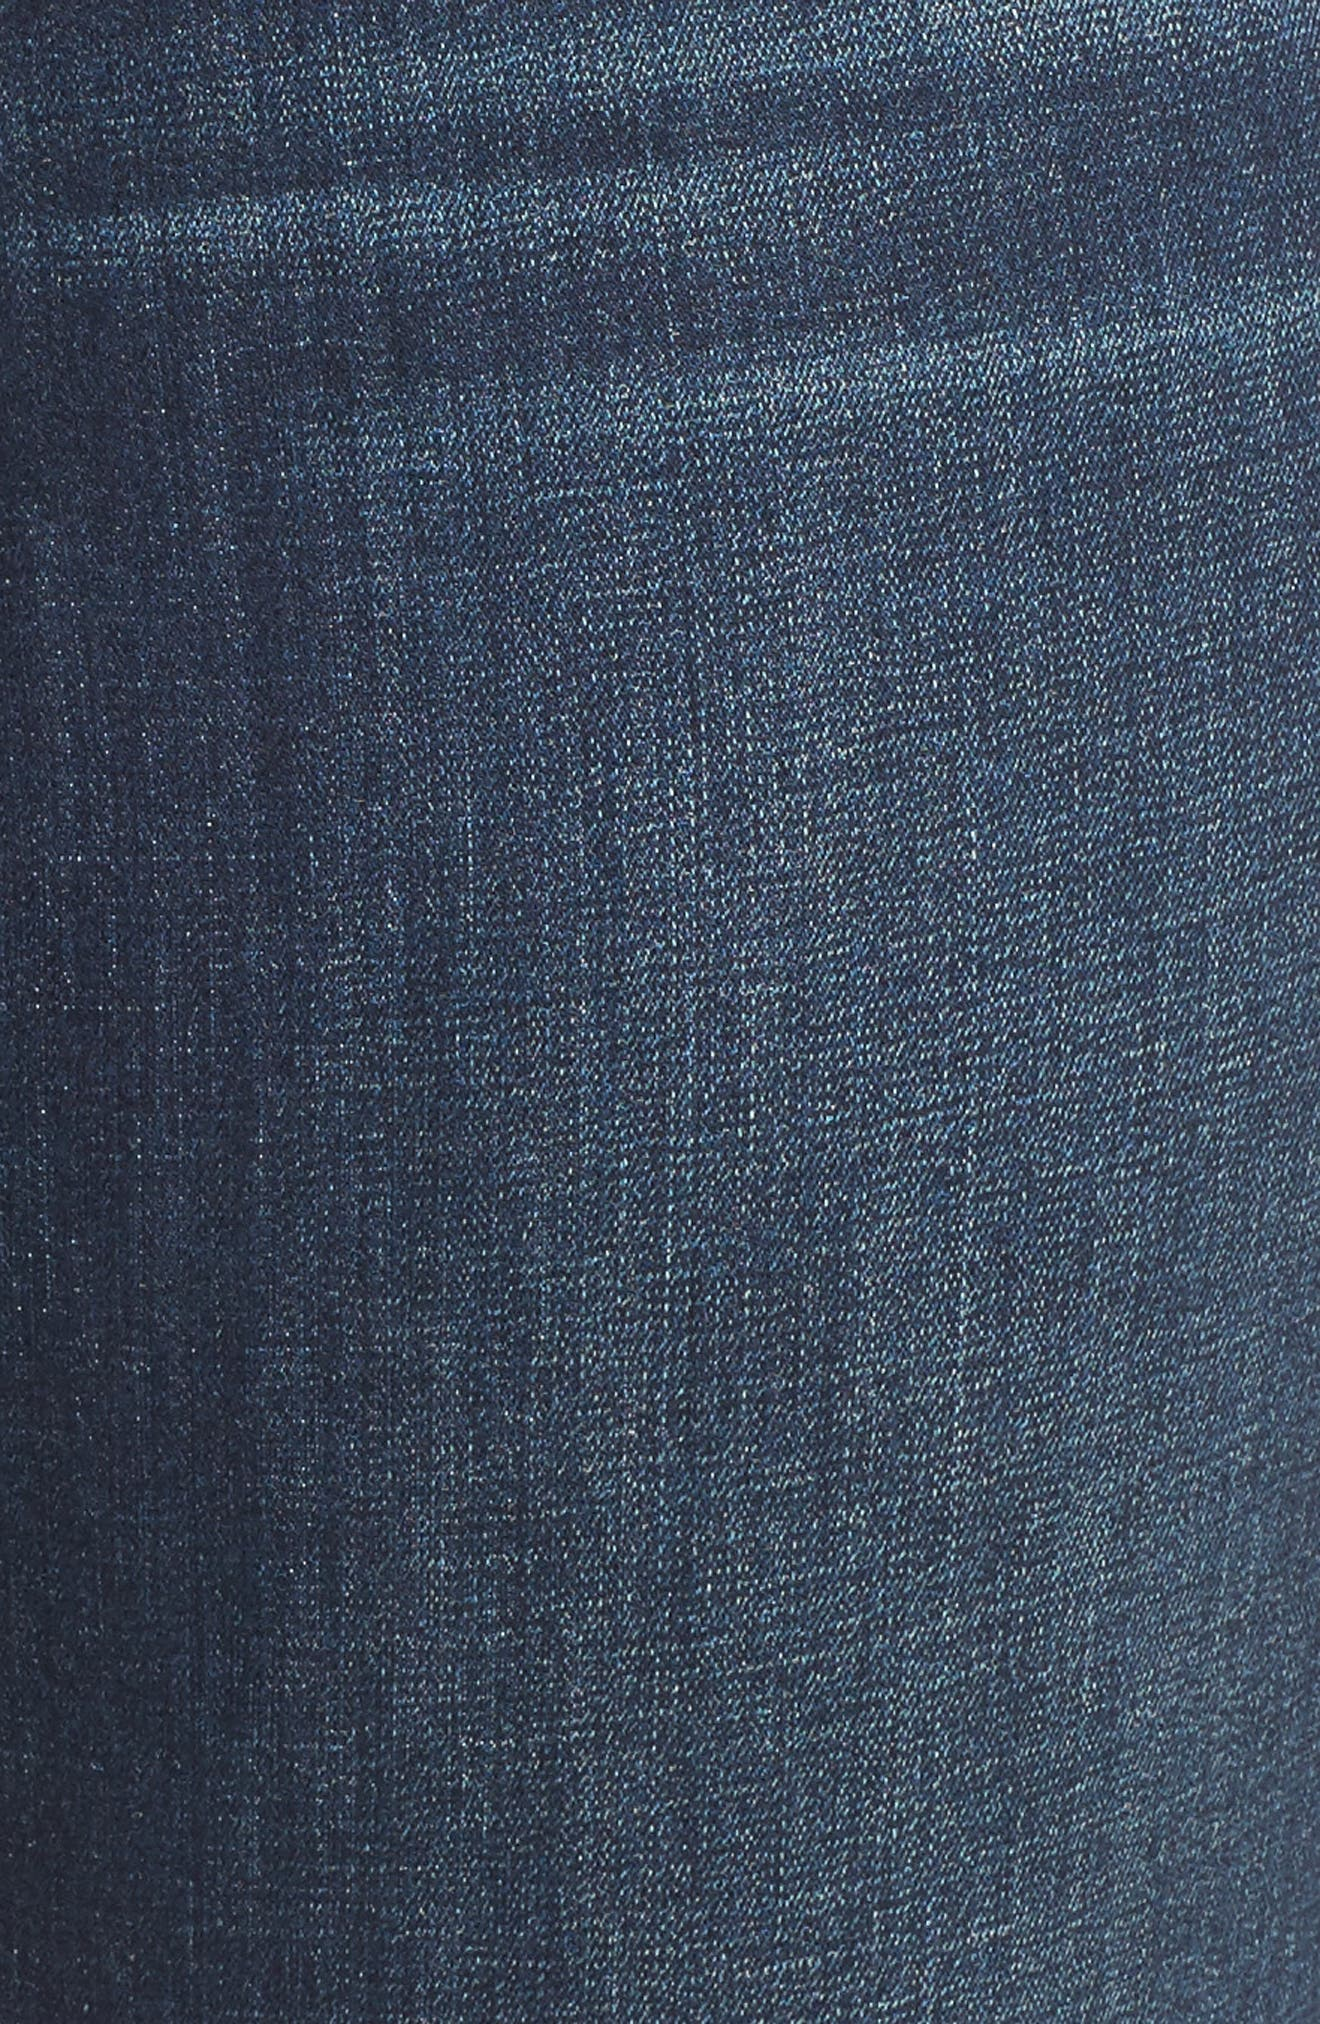 Ginger Bermuda Shorts,                             Alternate thumbnail 5, color,                             430